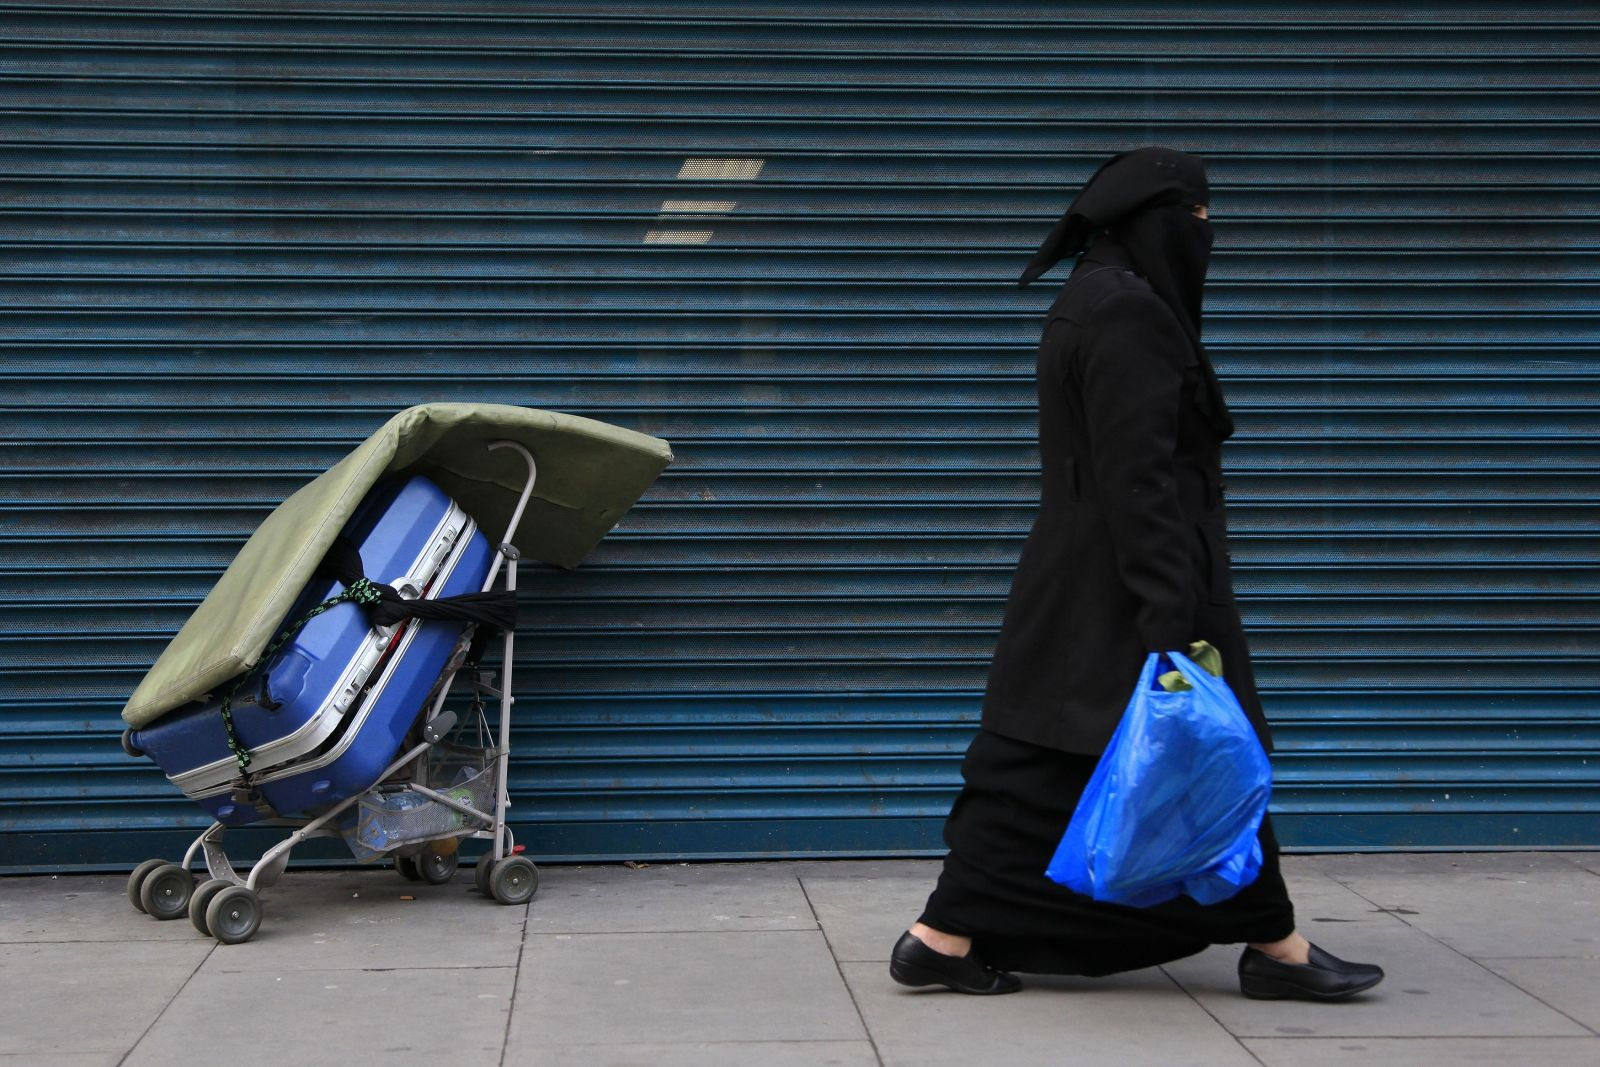 Muslim woman veiled London